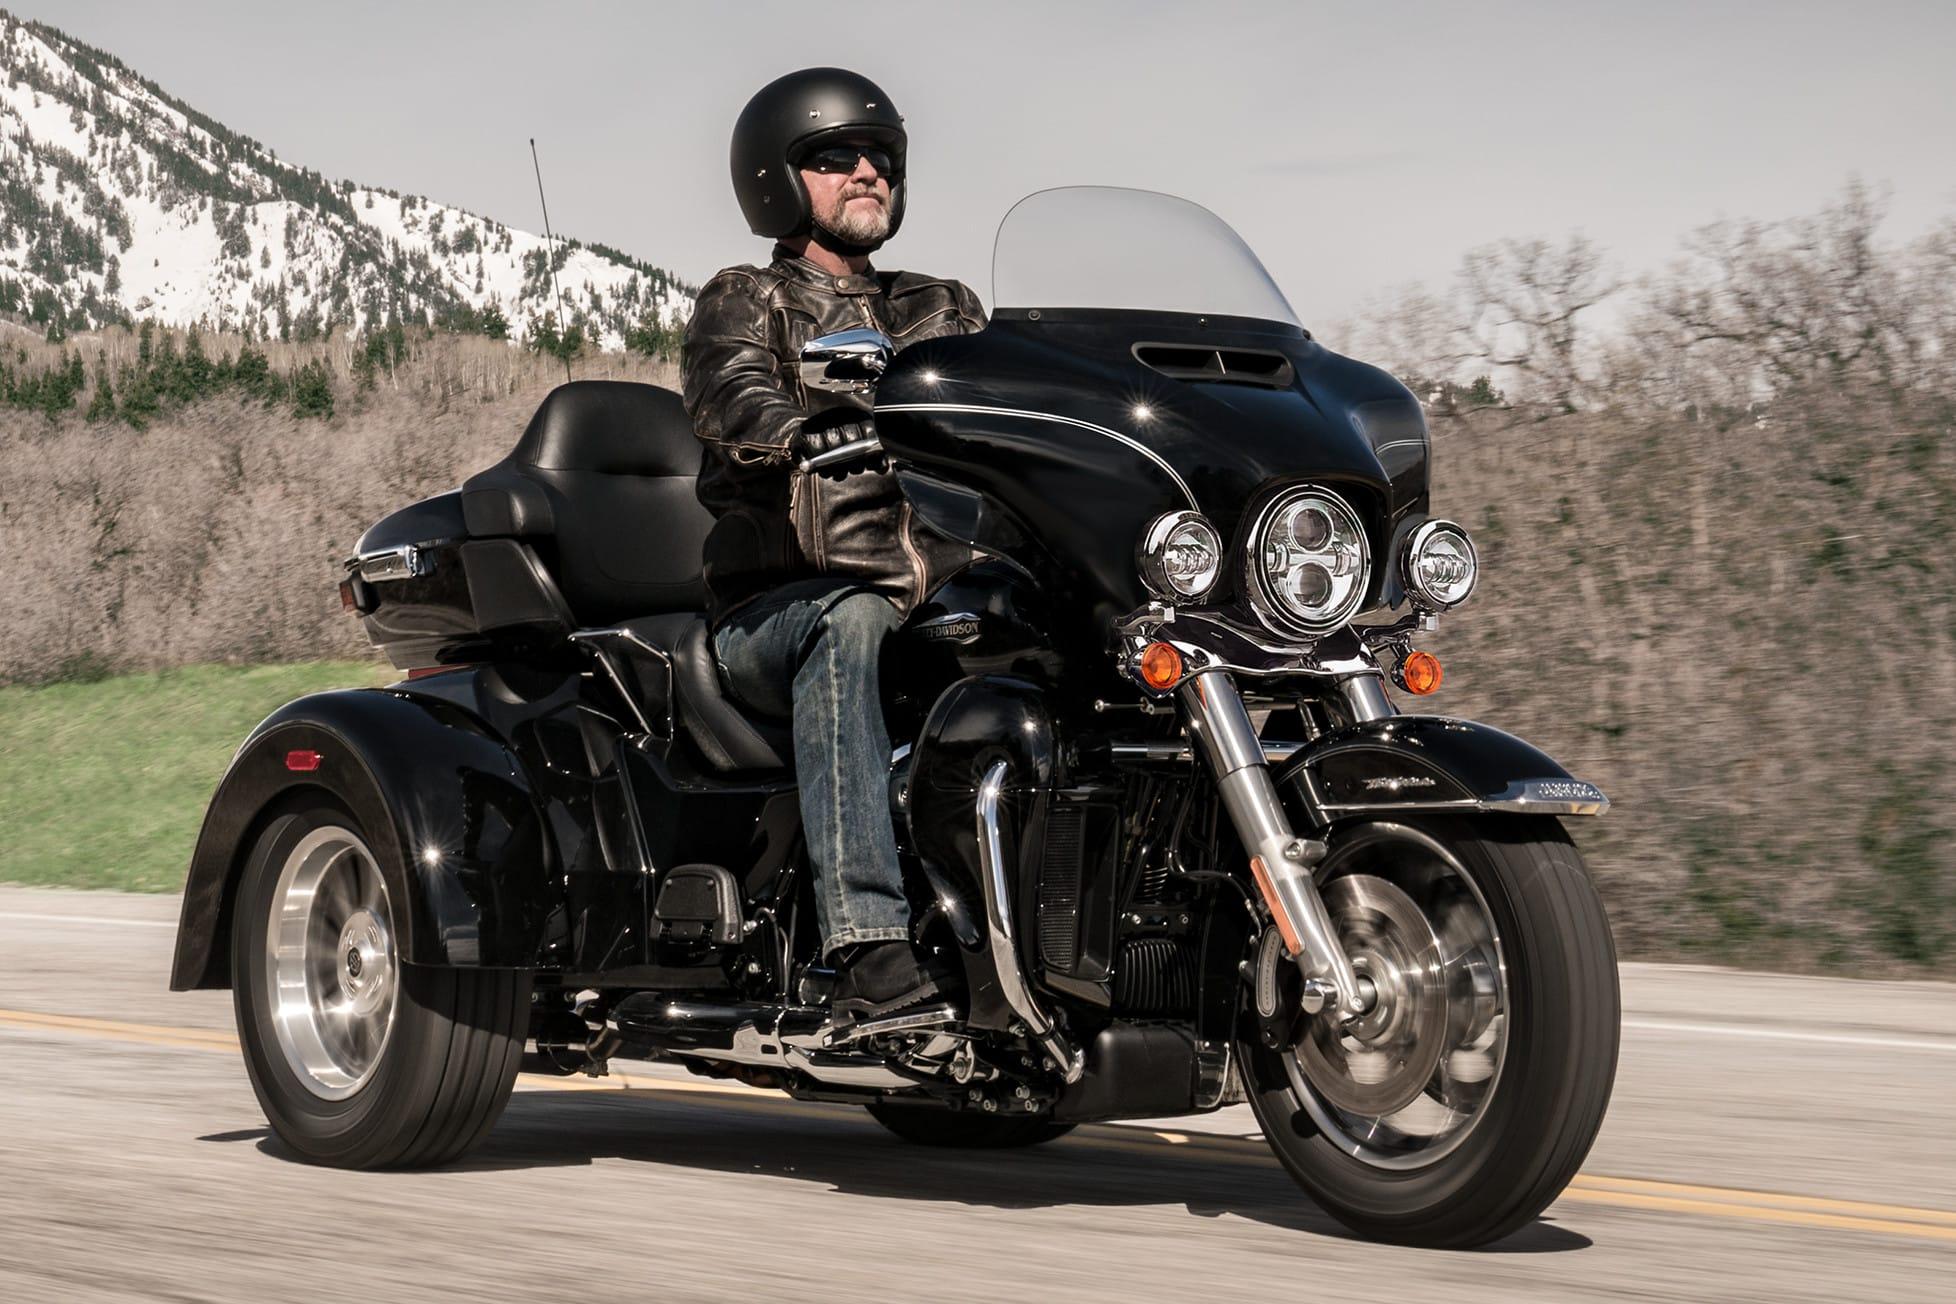 Wiring Diagram For Hd Tri Glide Schematics Diagrams 2014 Harley Trailer Harness 2018 Ultra Davidson Usa Rh Com Wallpaper Seat